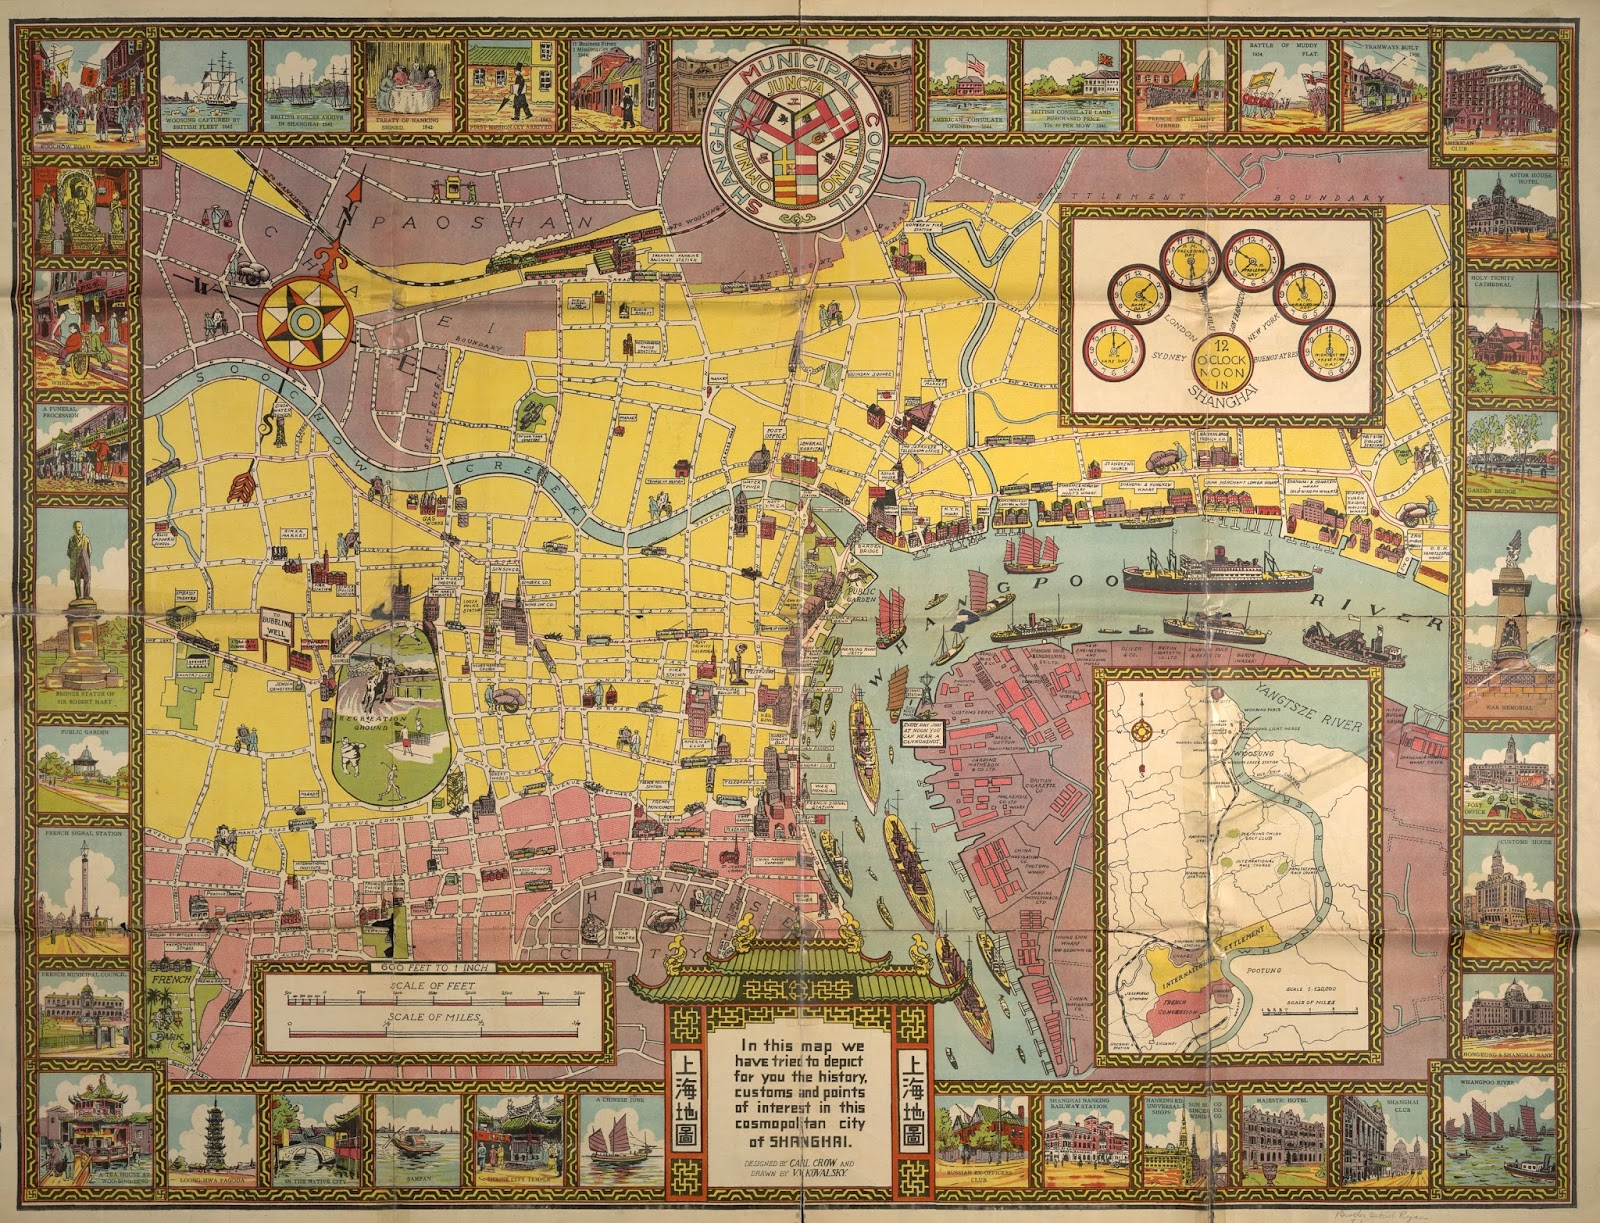 1935 historical map of shanghai